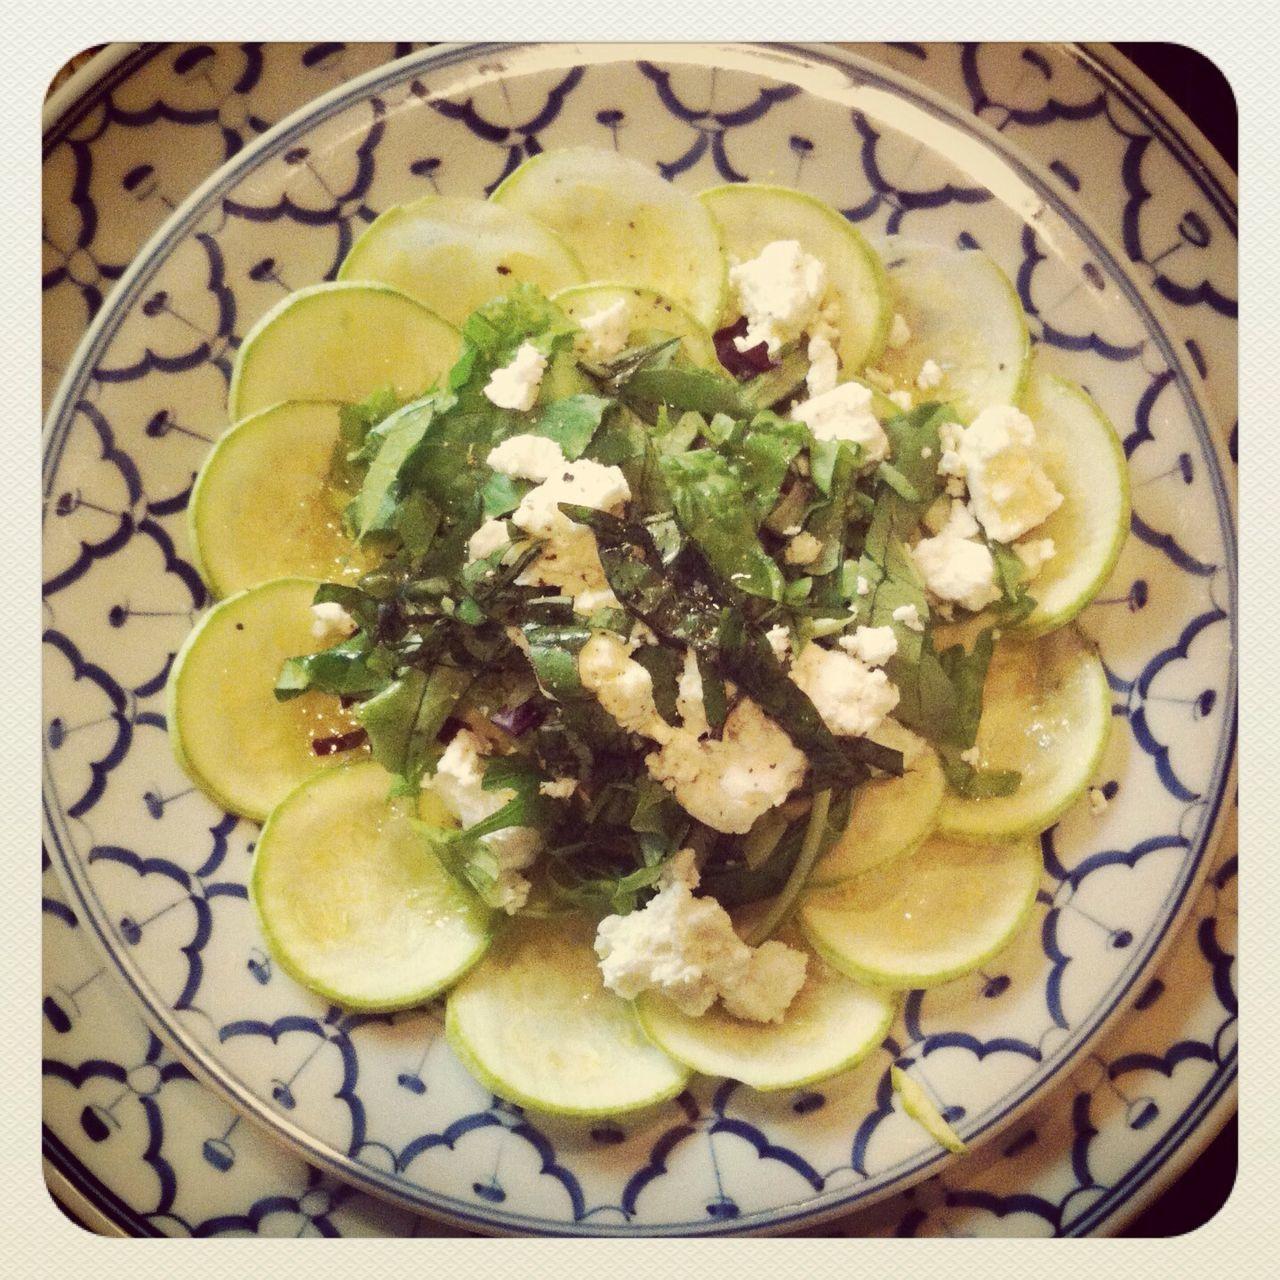 Vegetarian Food On Plate